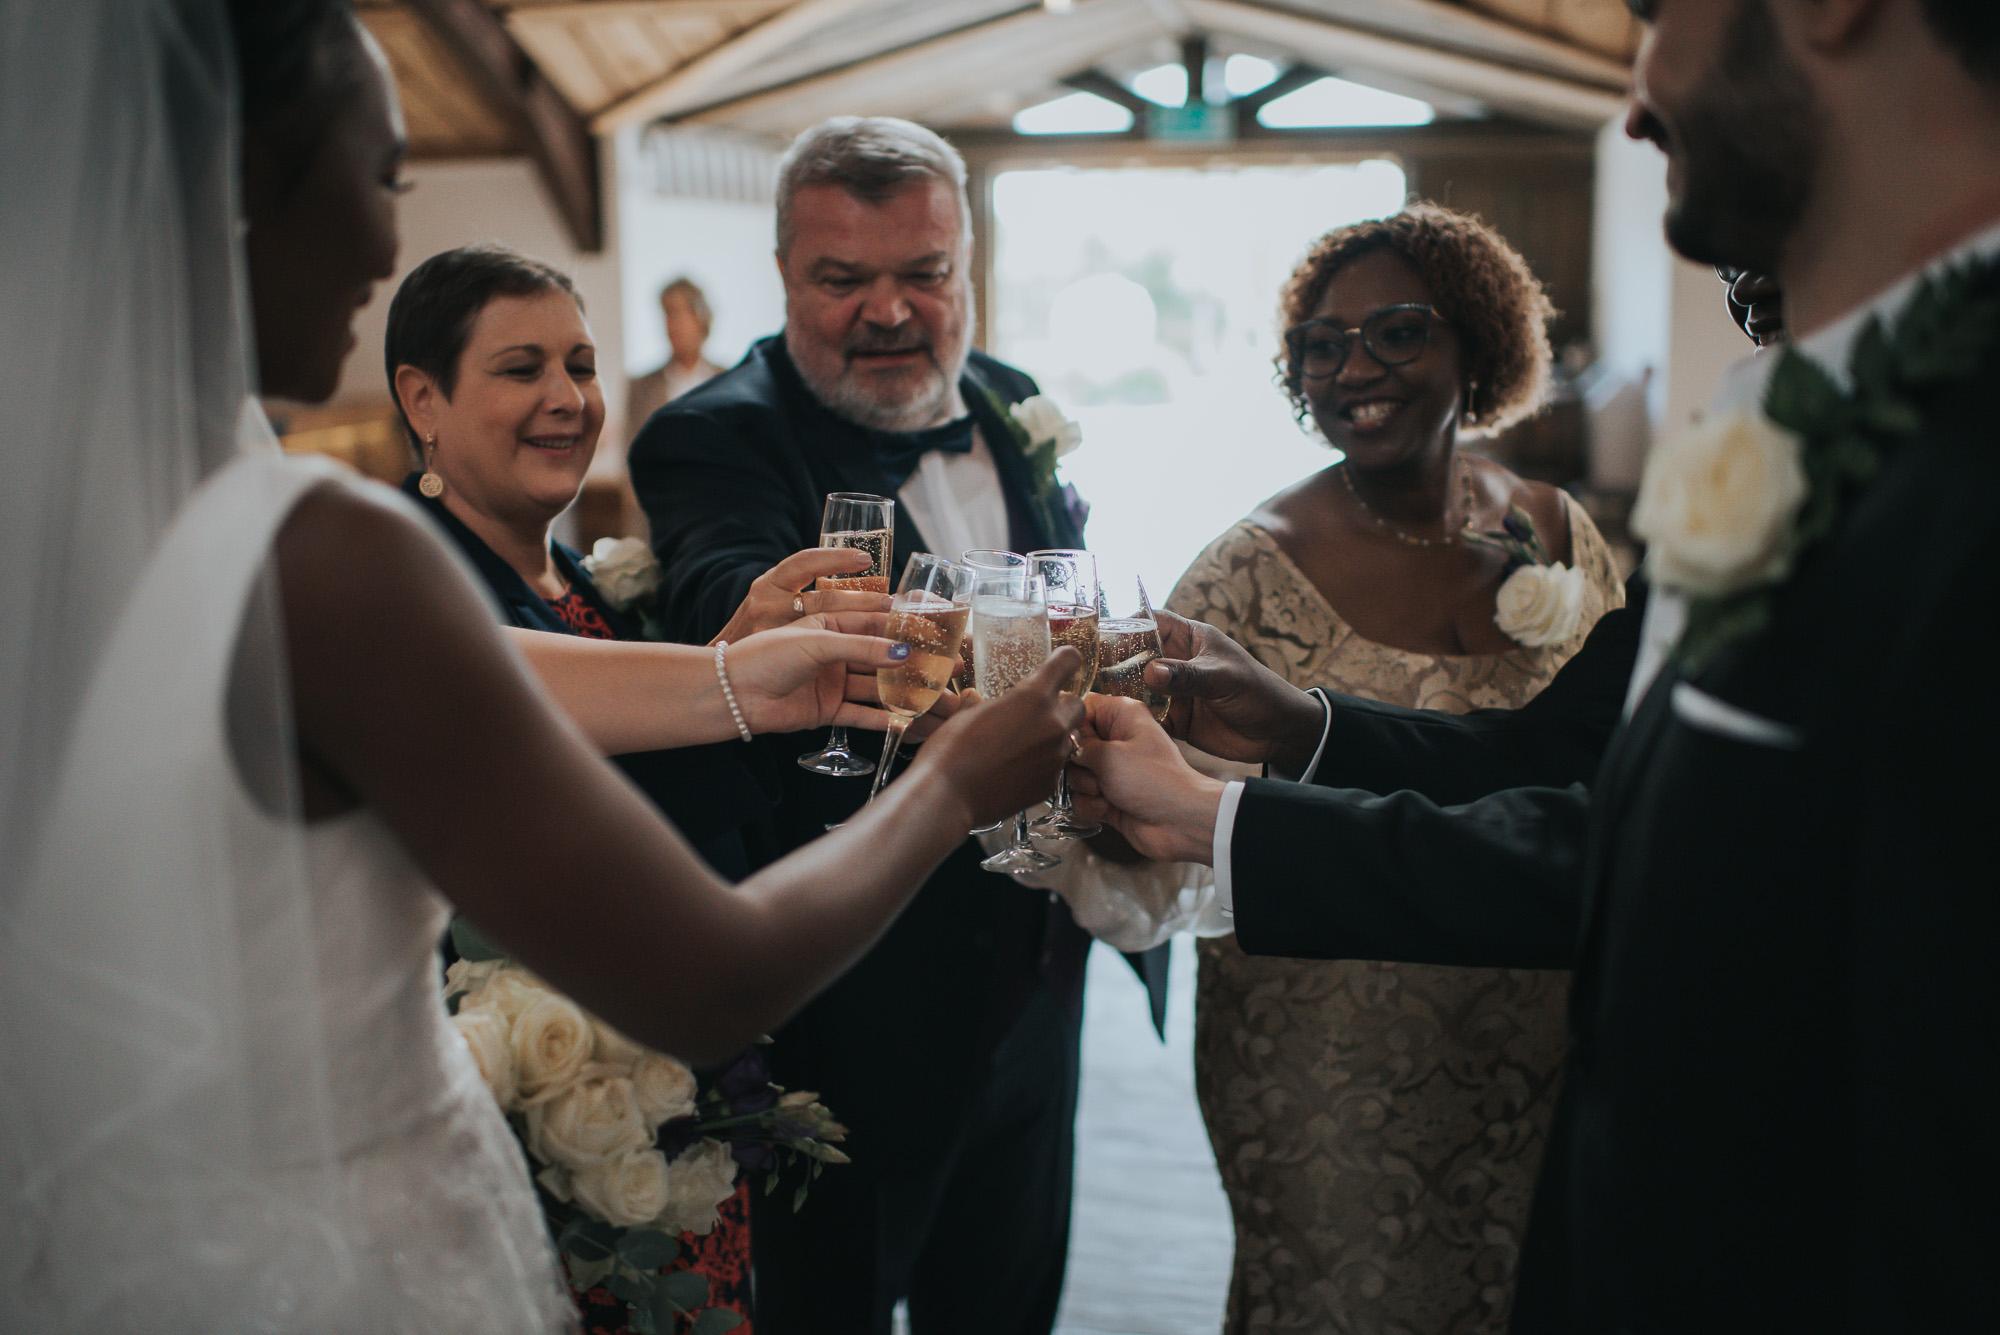 Owen HOuse Wedding Barn WEdding Photographer cheshire adam joe roberts photography (22 of 36).jpg